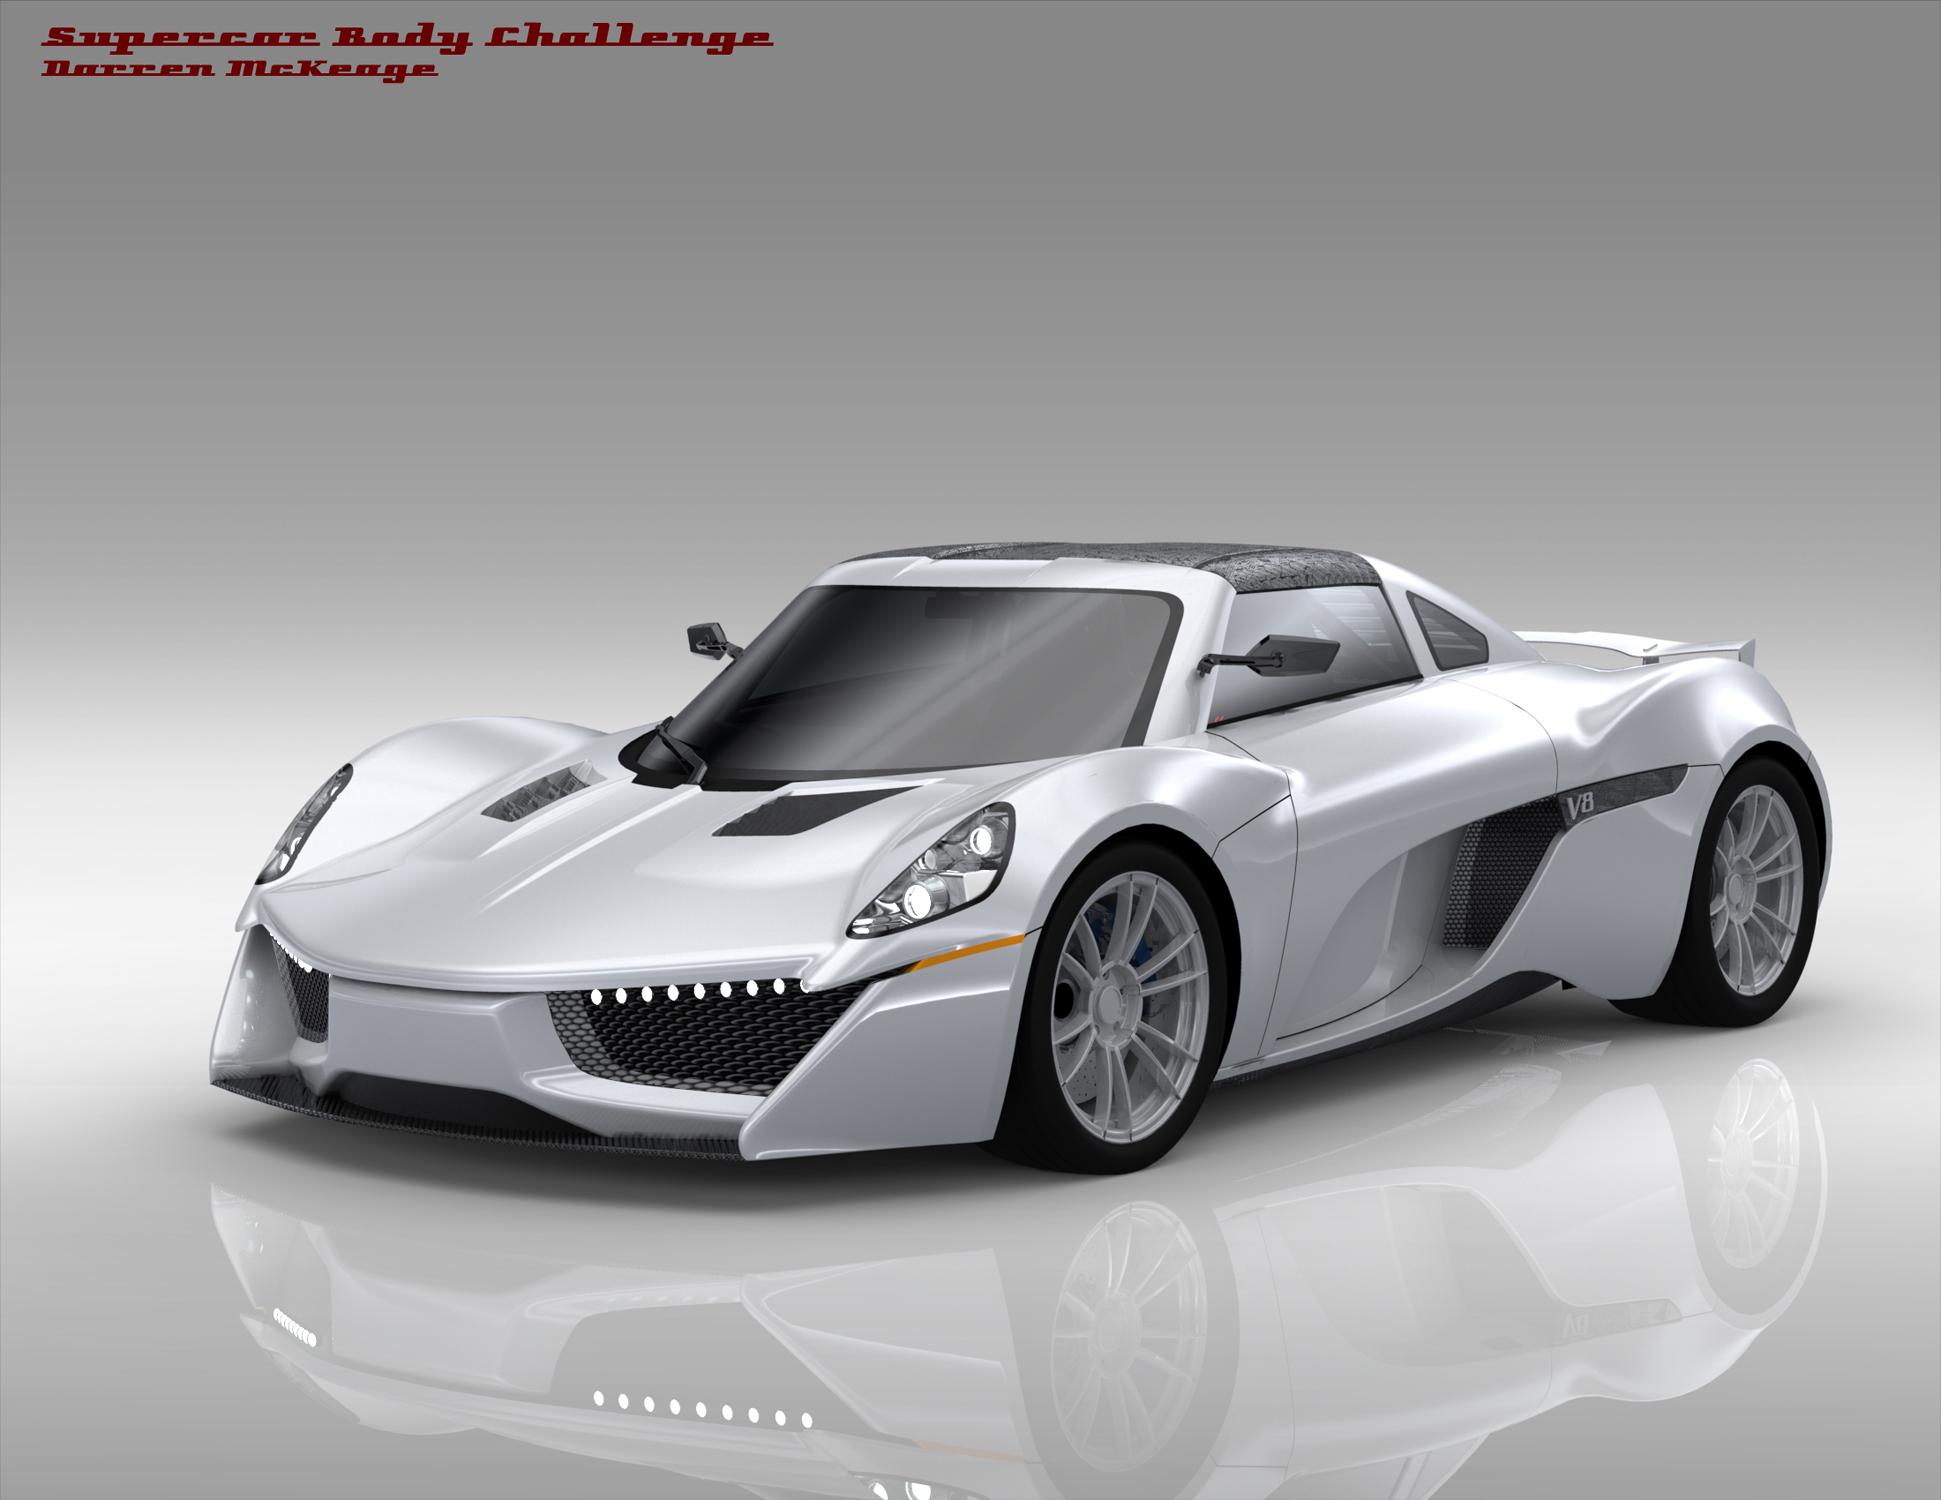 Keage Concepts Alberta Automotive Design